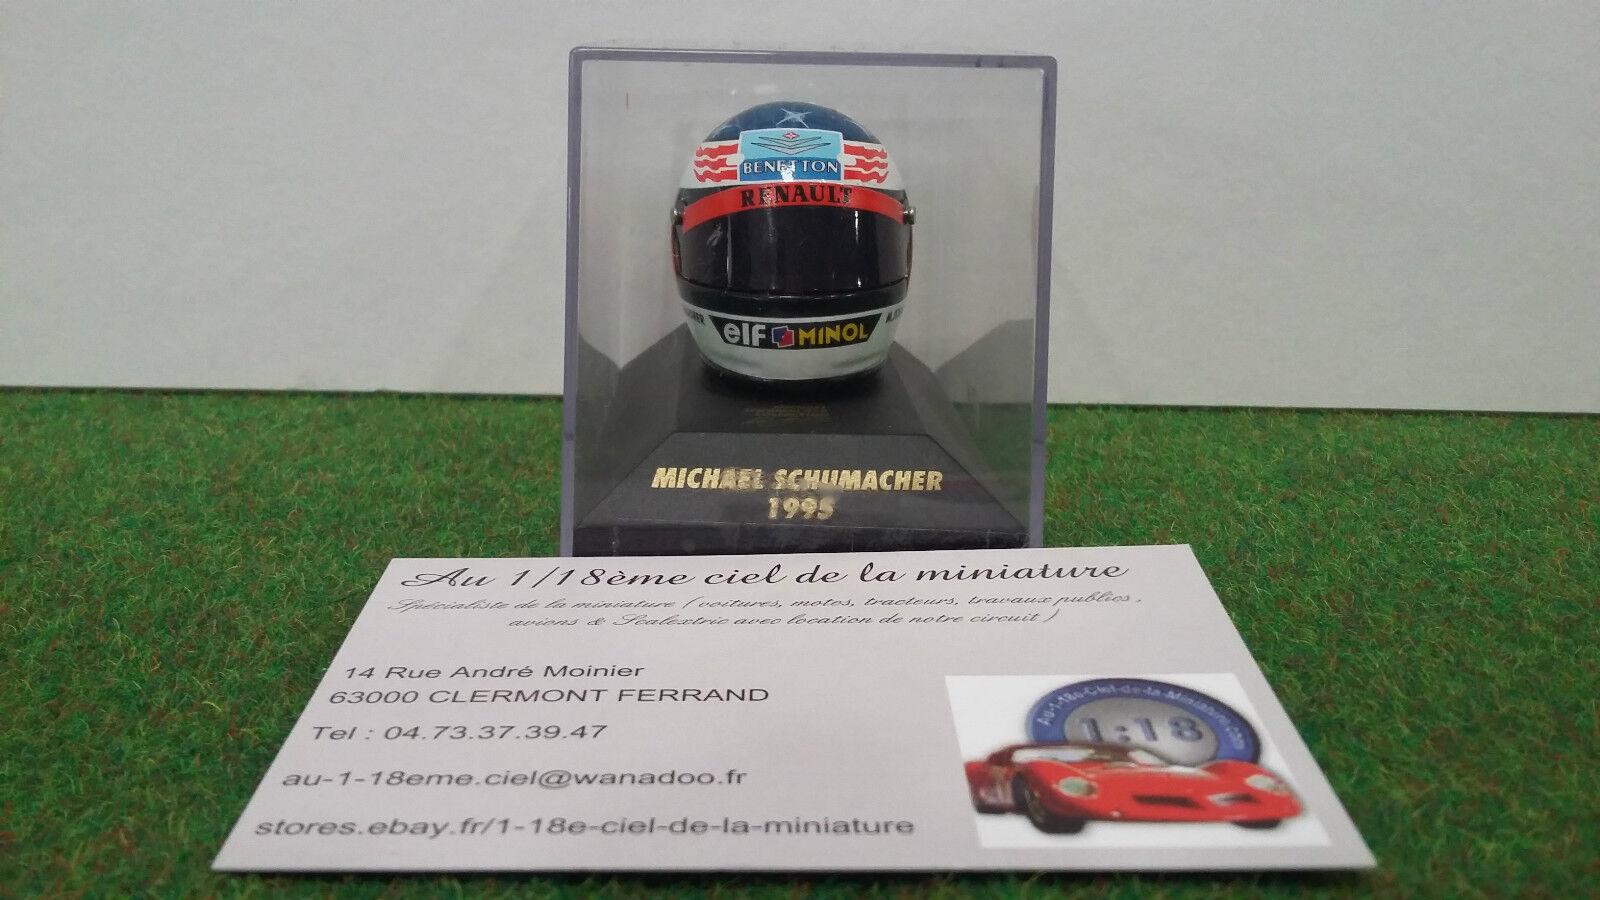 la mejor selección de HELMET F1 CASQUE PILOTE formule 1 1 1 Mich.. SCHUMACHER 1995 BENETTON 1 8 MINICHAMPS  Tienda 2018